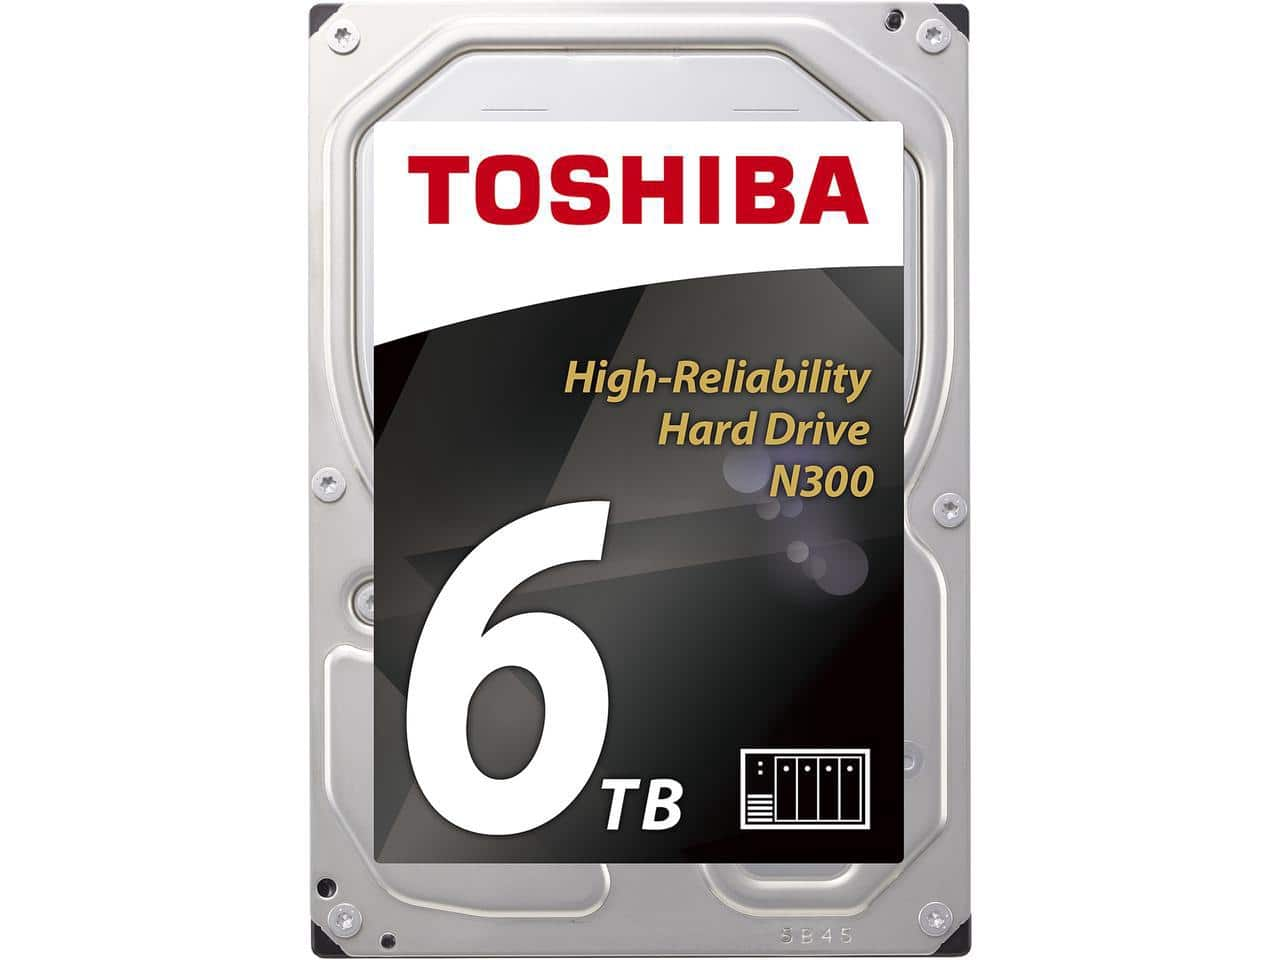 Toshiba N300 6TB High Reliability NAS Hard Drive 7200 RPM 128MB Cache $163.99 Free Ship